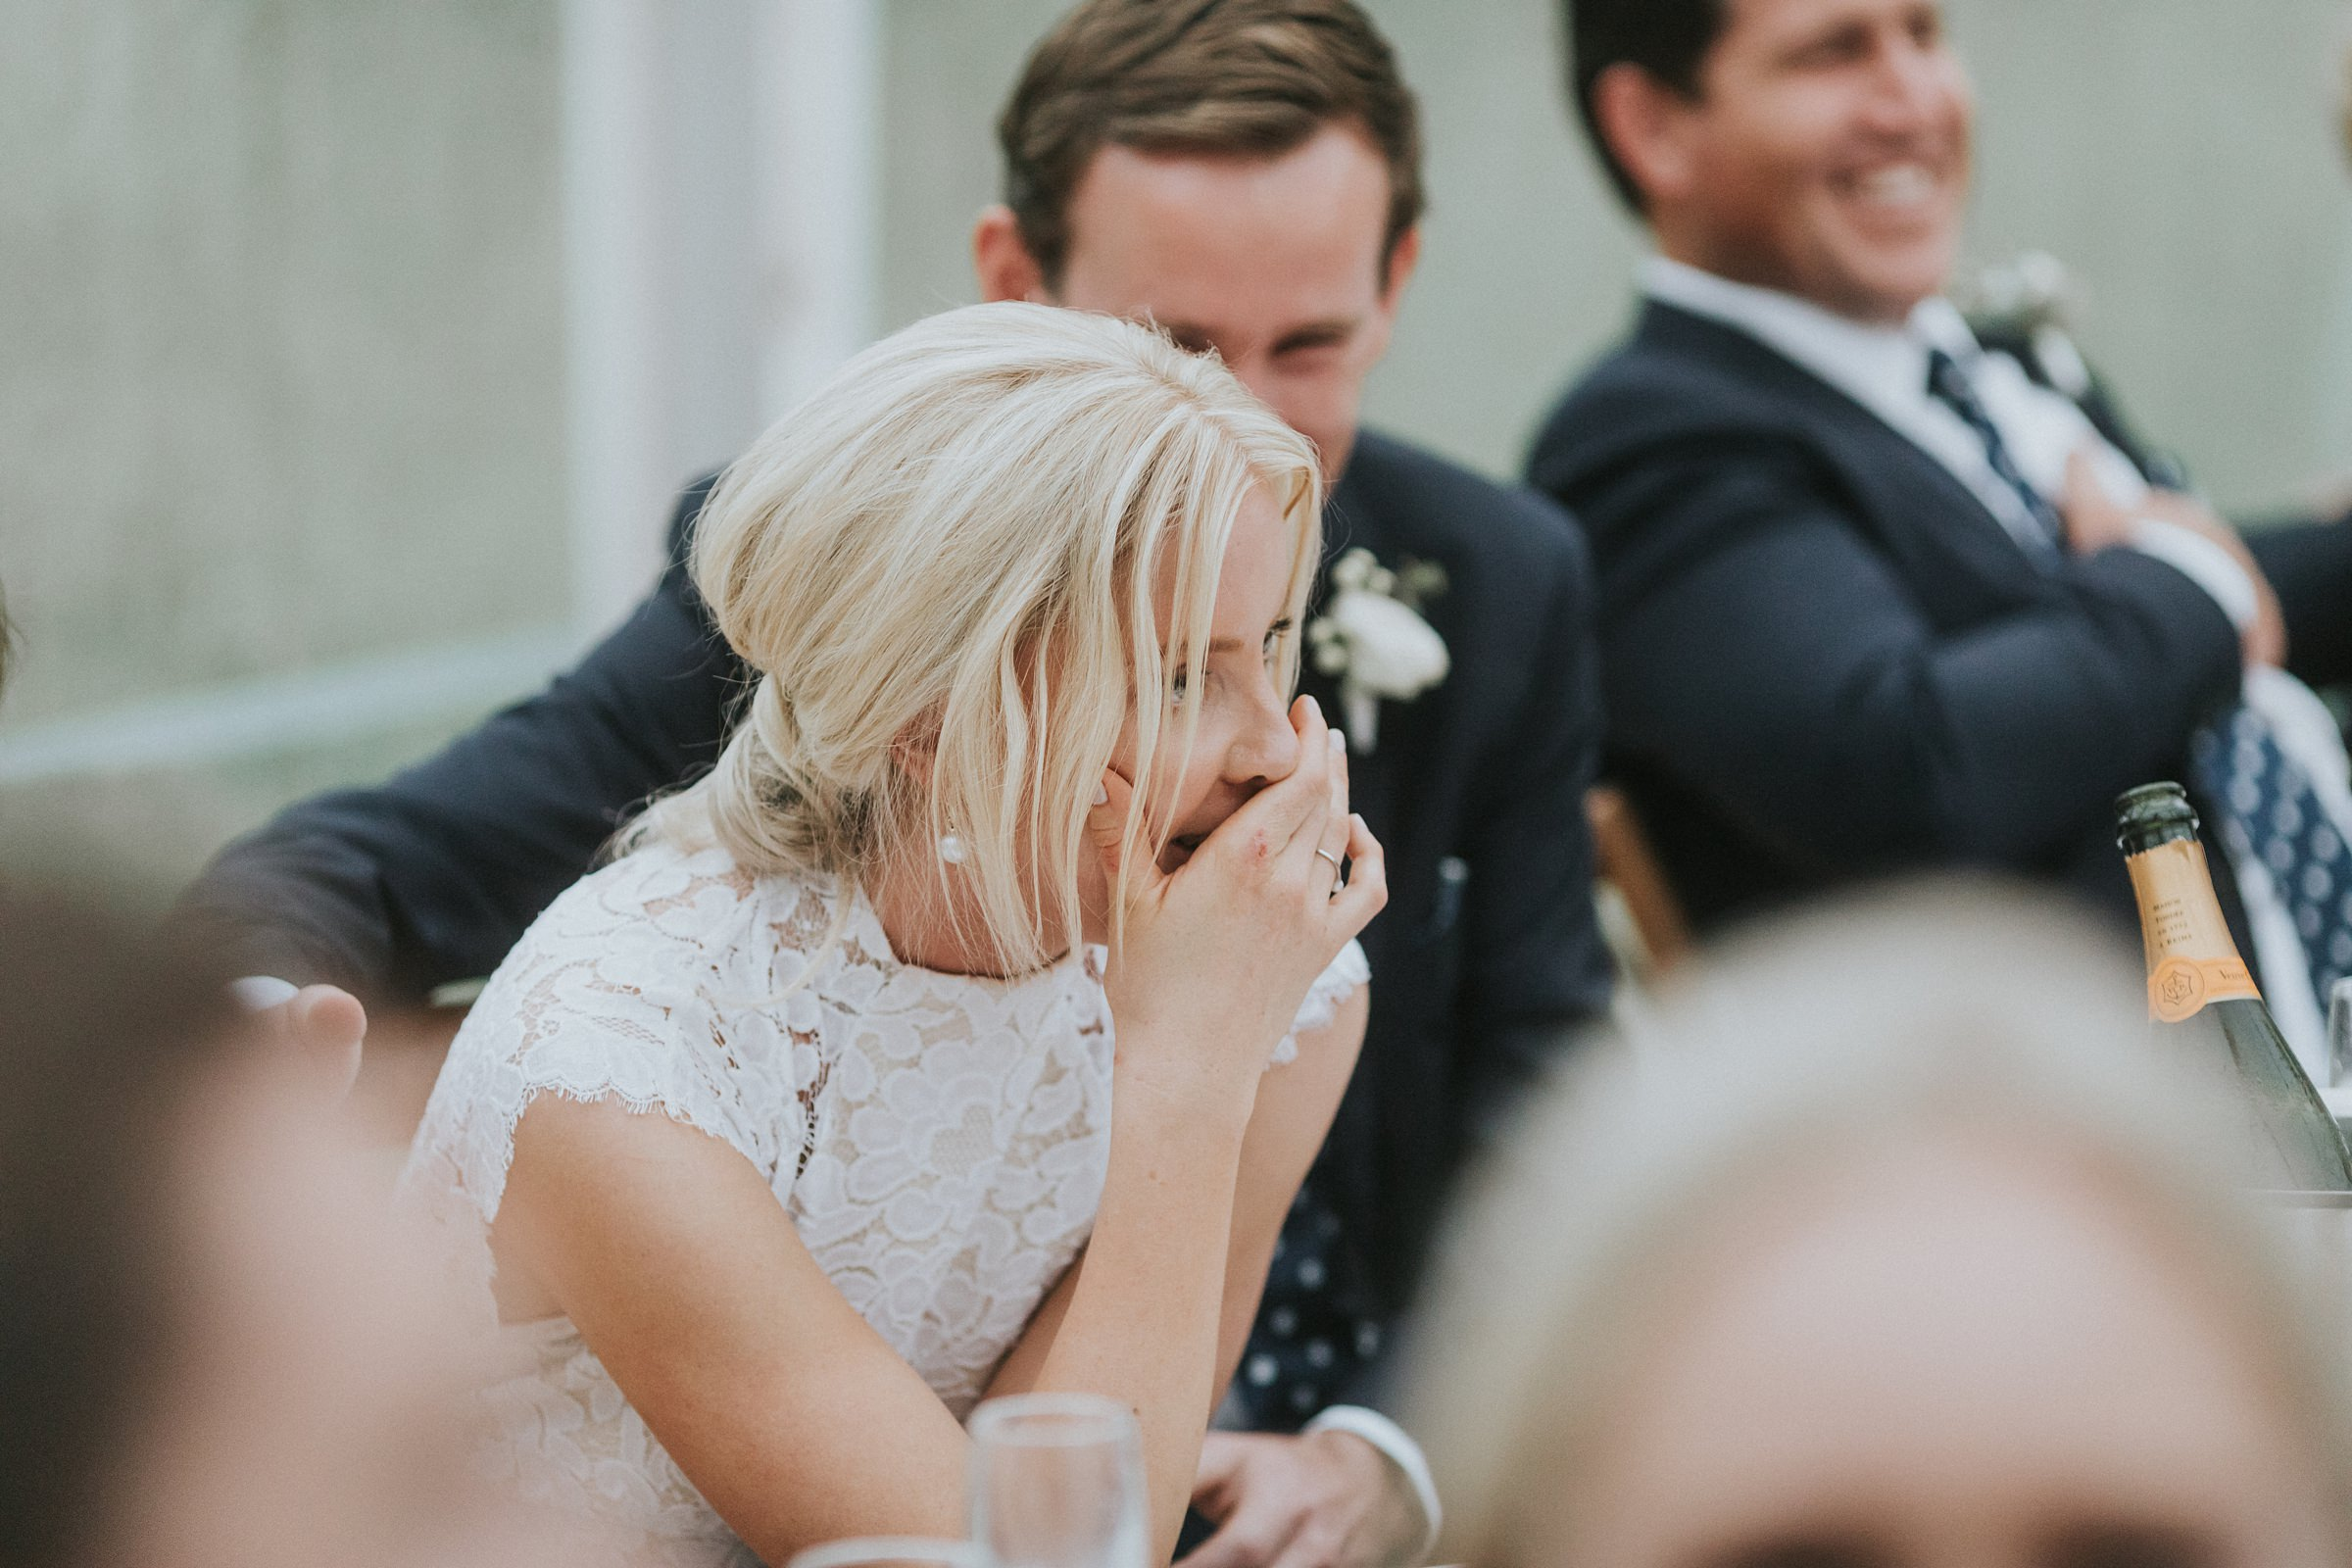 bride enjoying the speeches during wedding reception